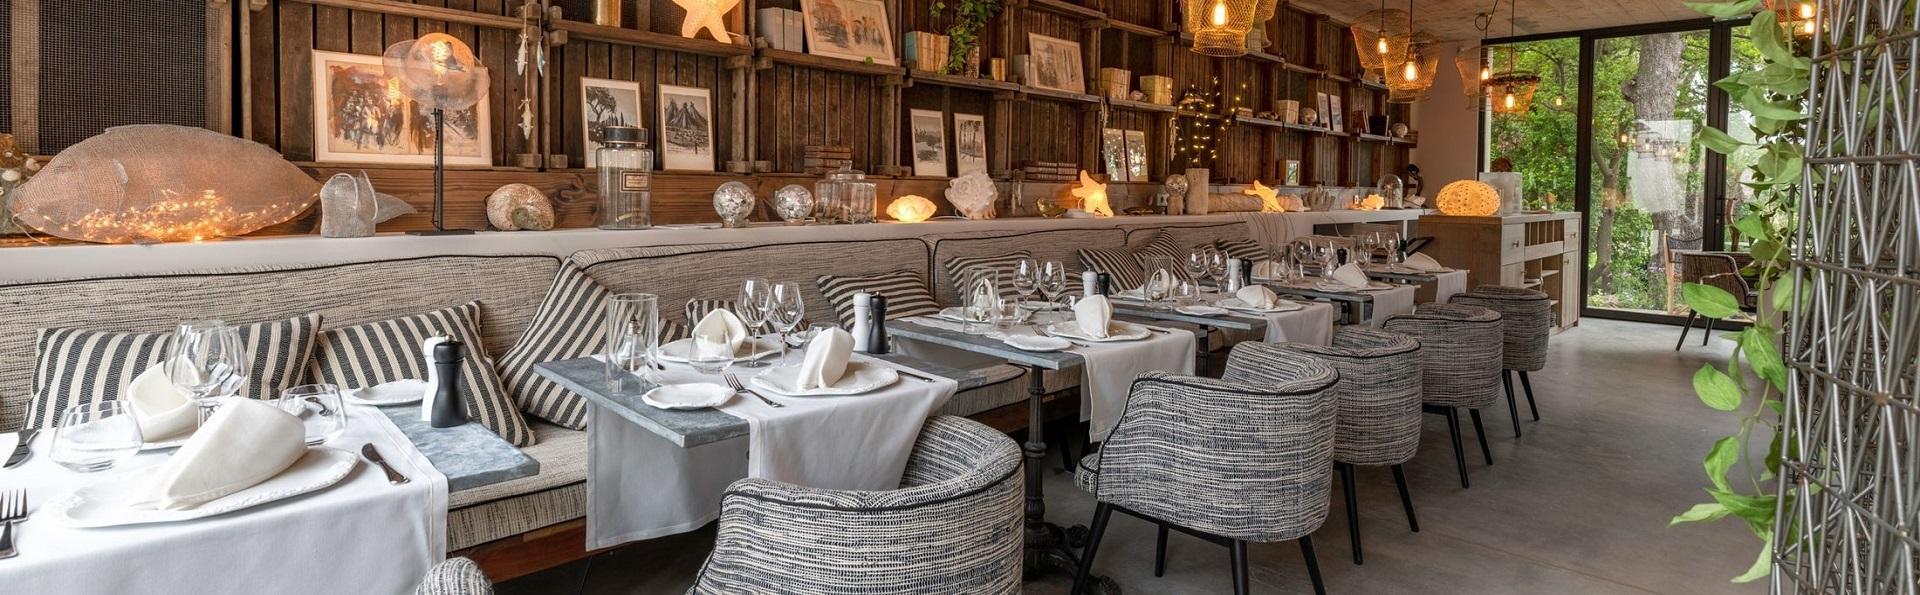 domaine-tarbouriech-herault-beziers-occitanie-seminaires-de-caractere-restaurant